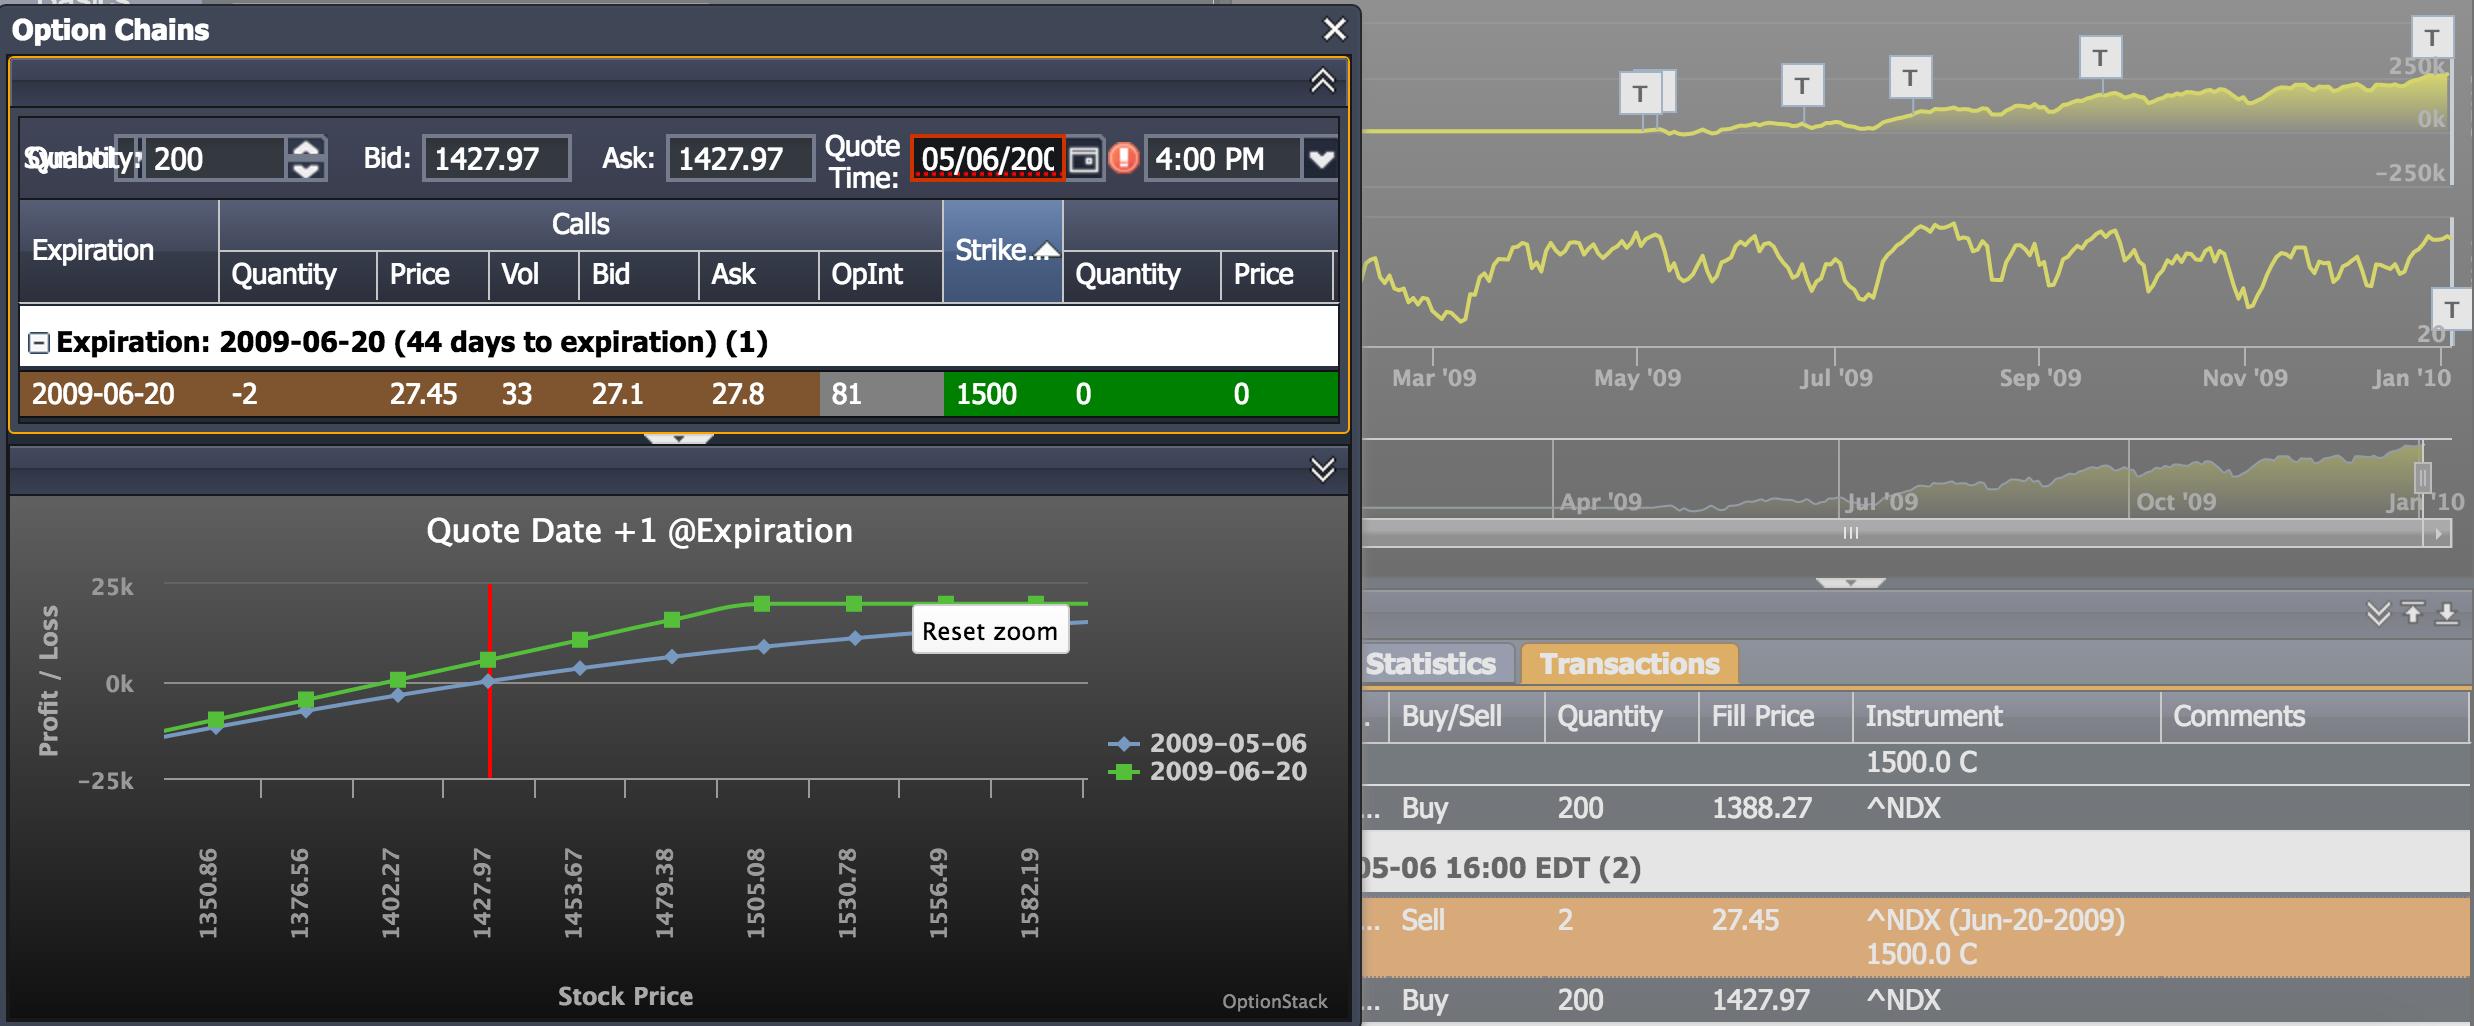 Wheatley option trading programs